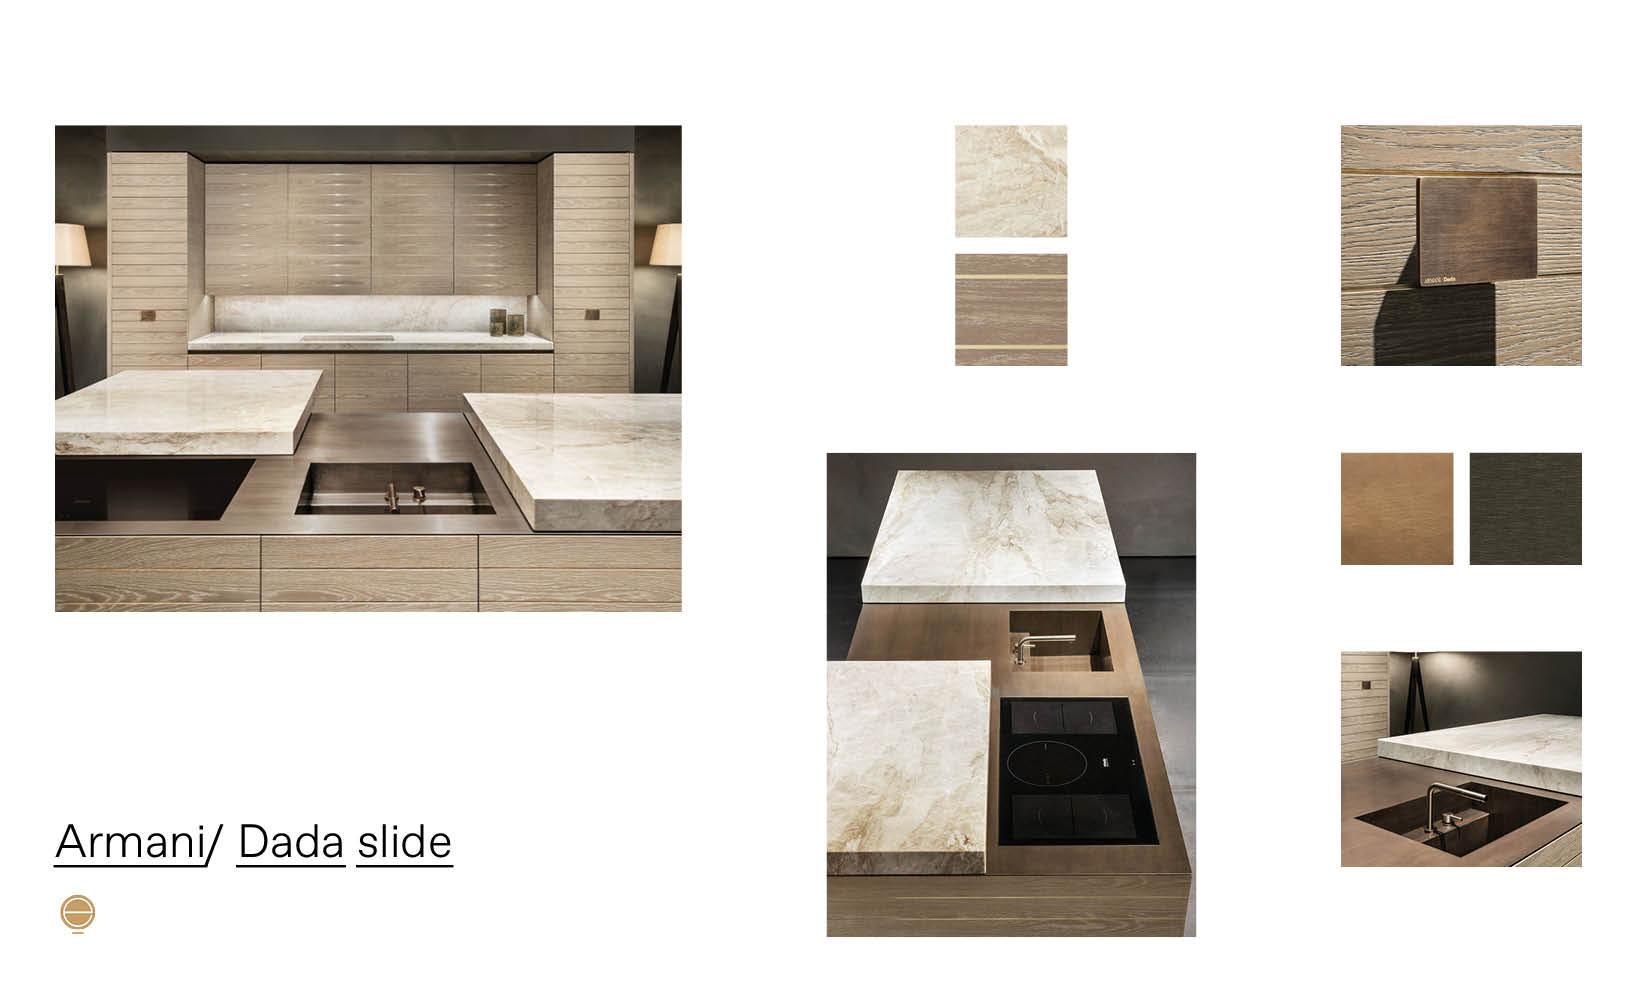 Armani Dada Slide luxury modular kitchen moodboard designed by Esperiri